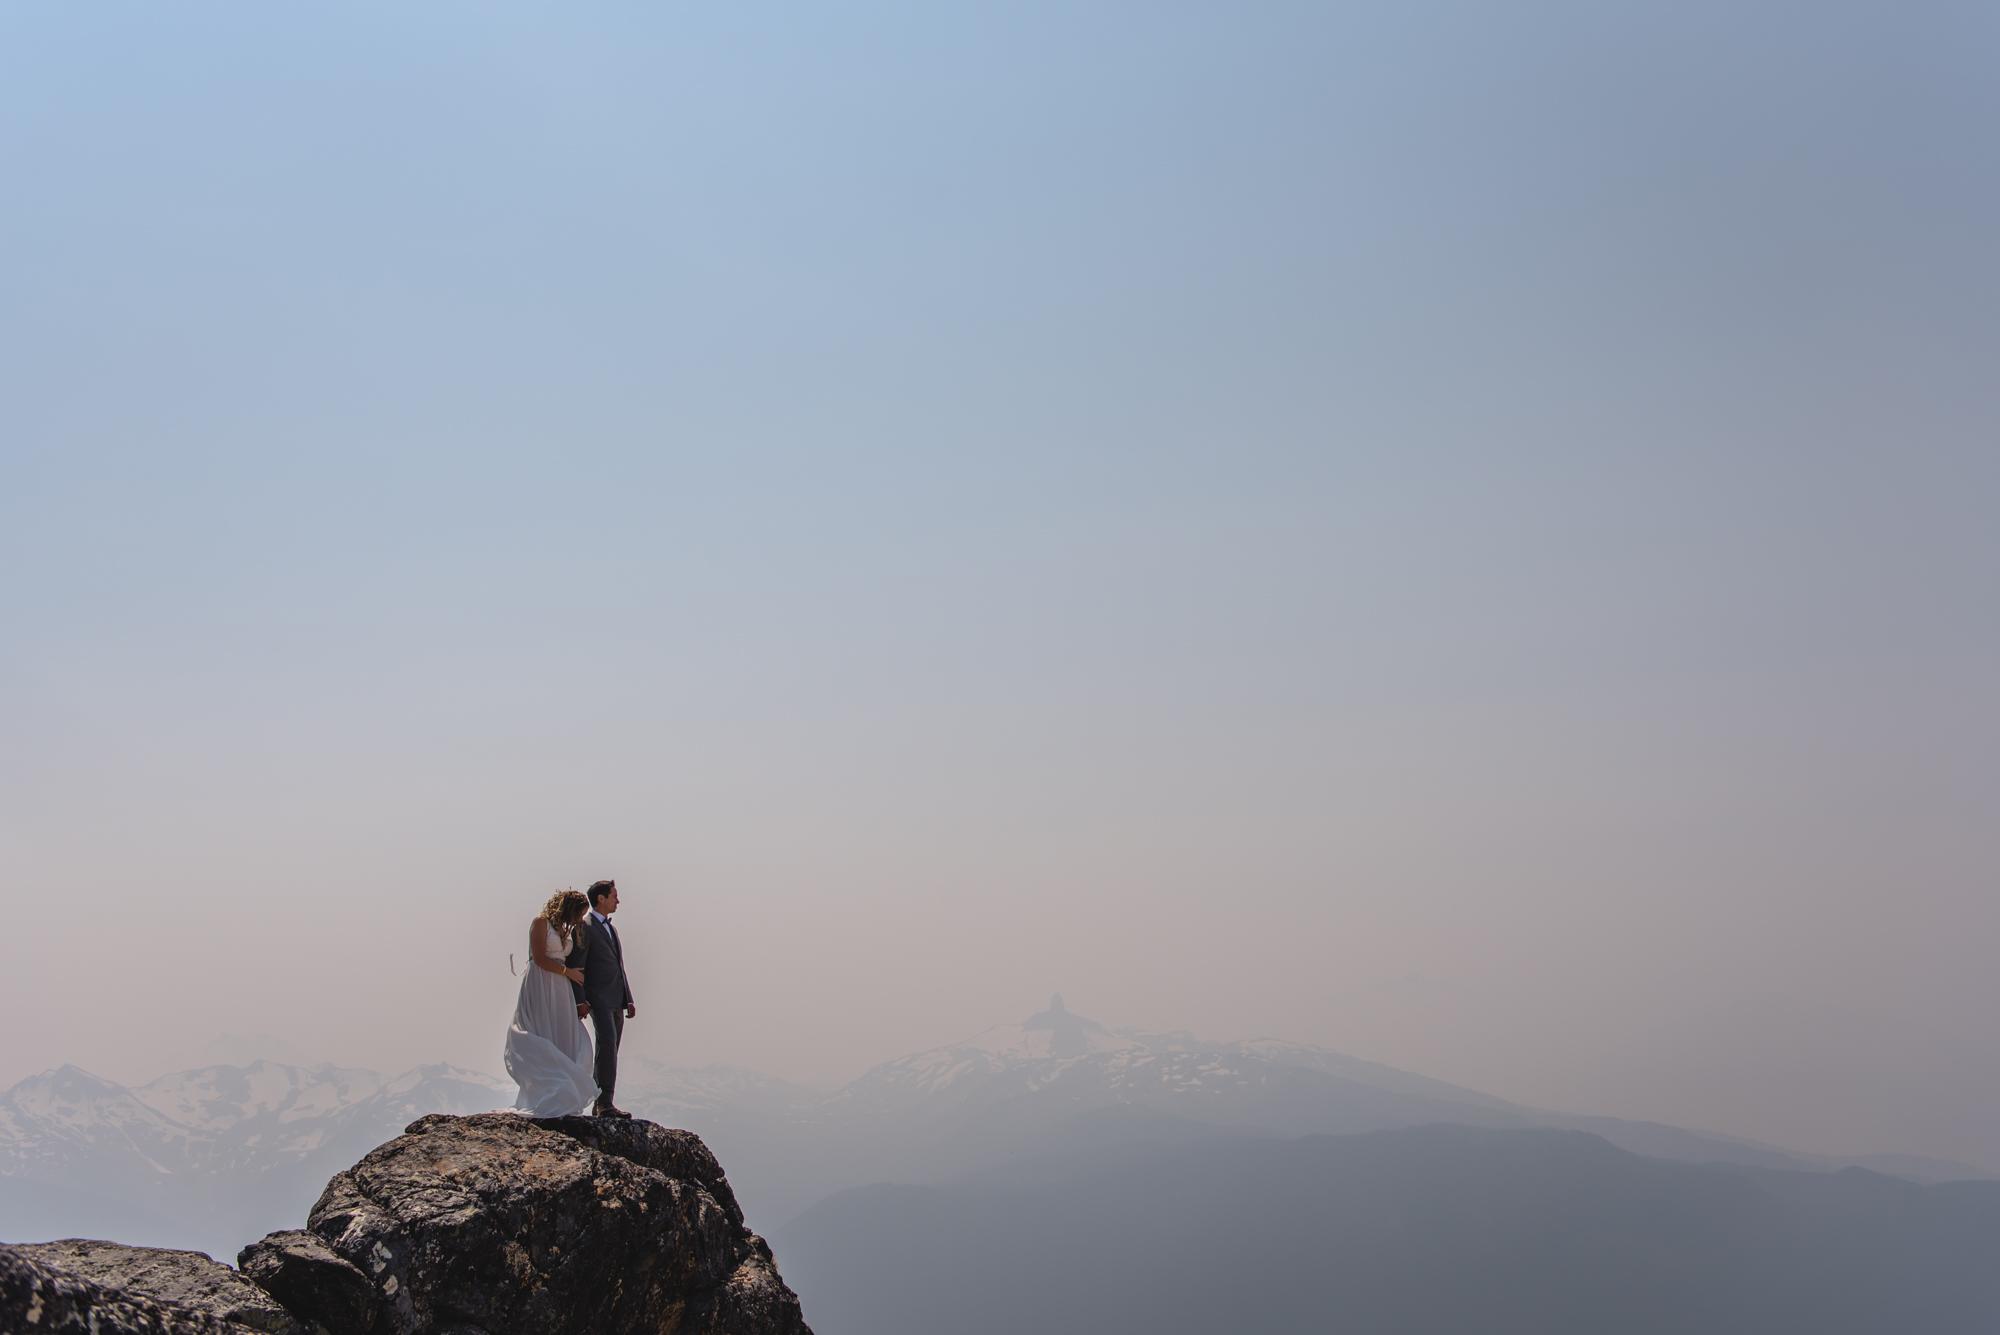 whistler peak wedding couple with black tusk